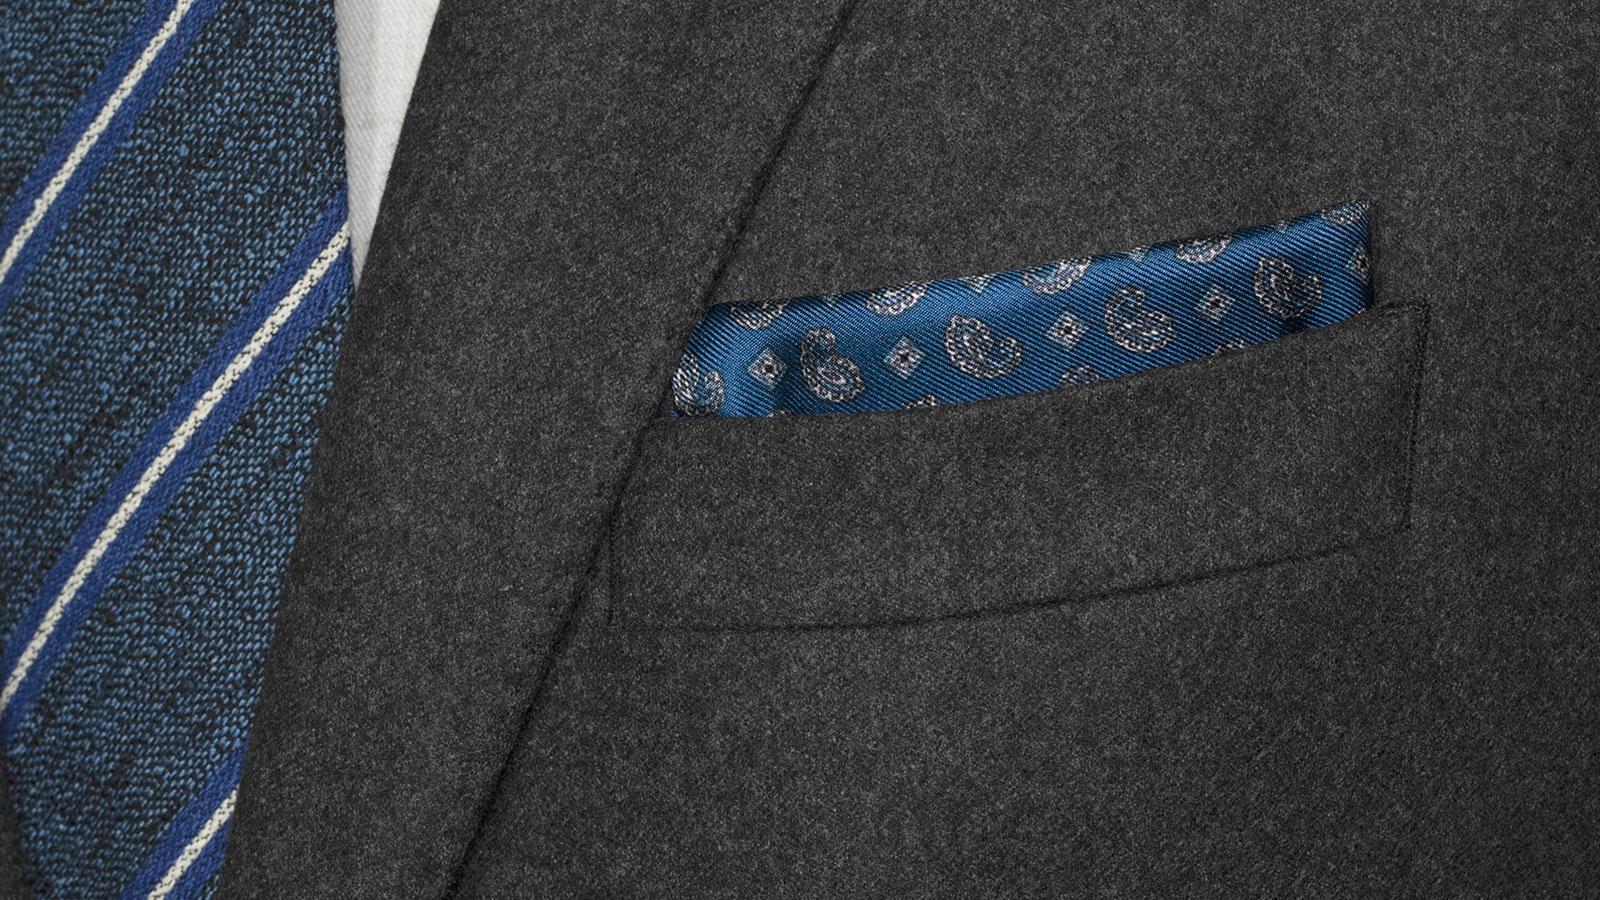 Sartorial Dark Grey Flannel 180s Suit - slider image 1